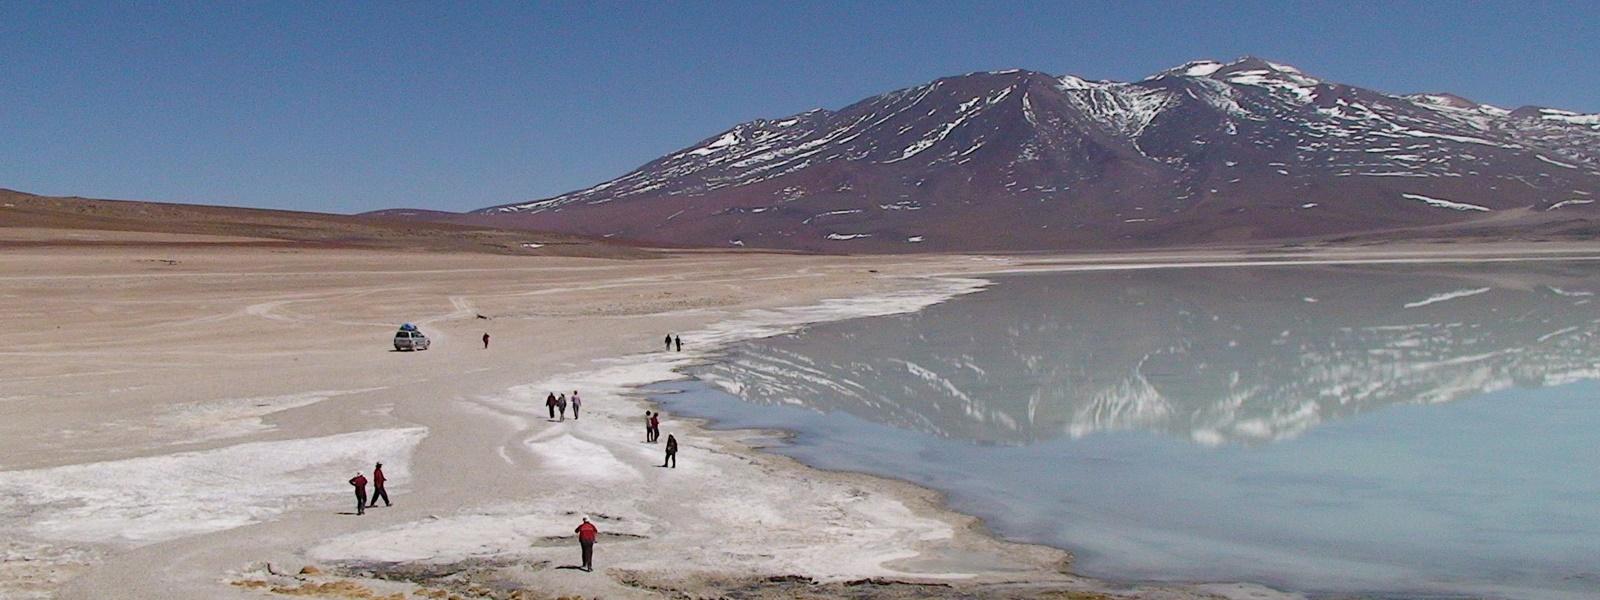 altiplano bolivien, groupe Surinmenso en balade